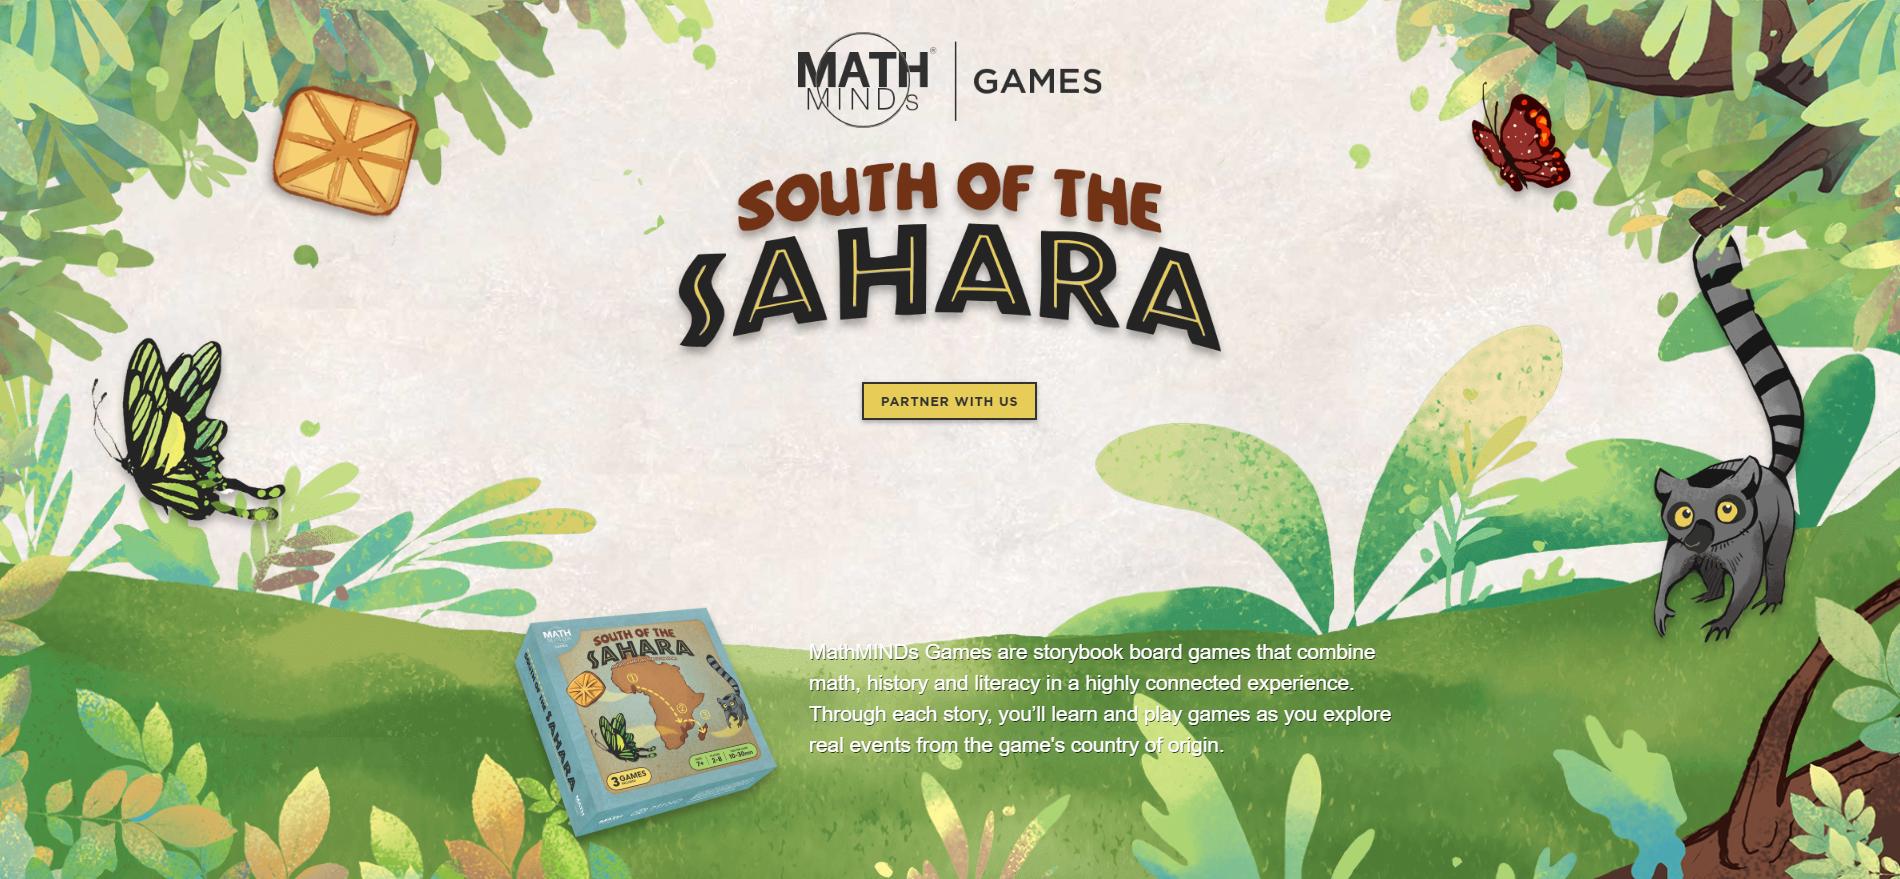 mathminds-games-webpage